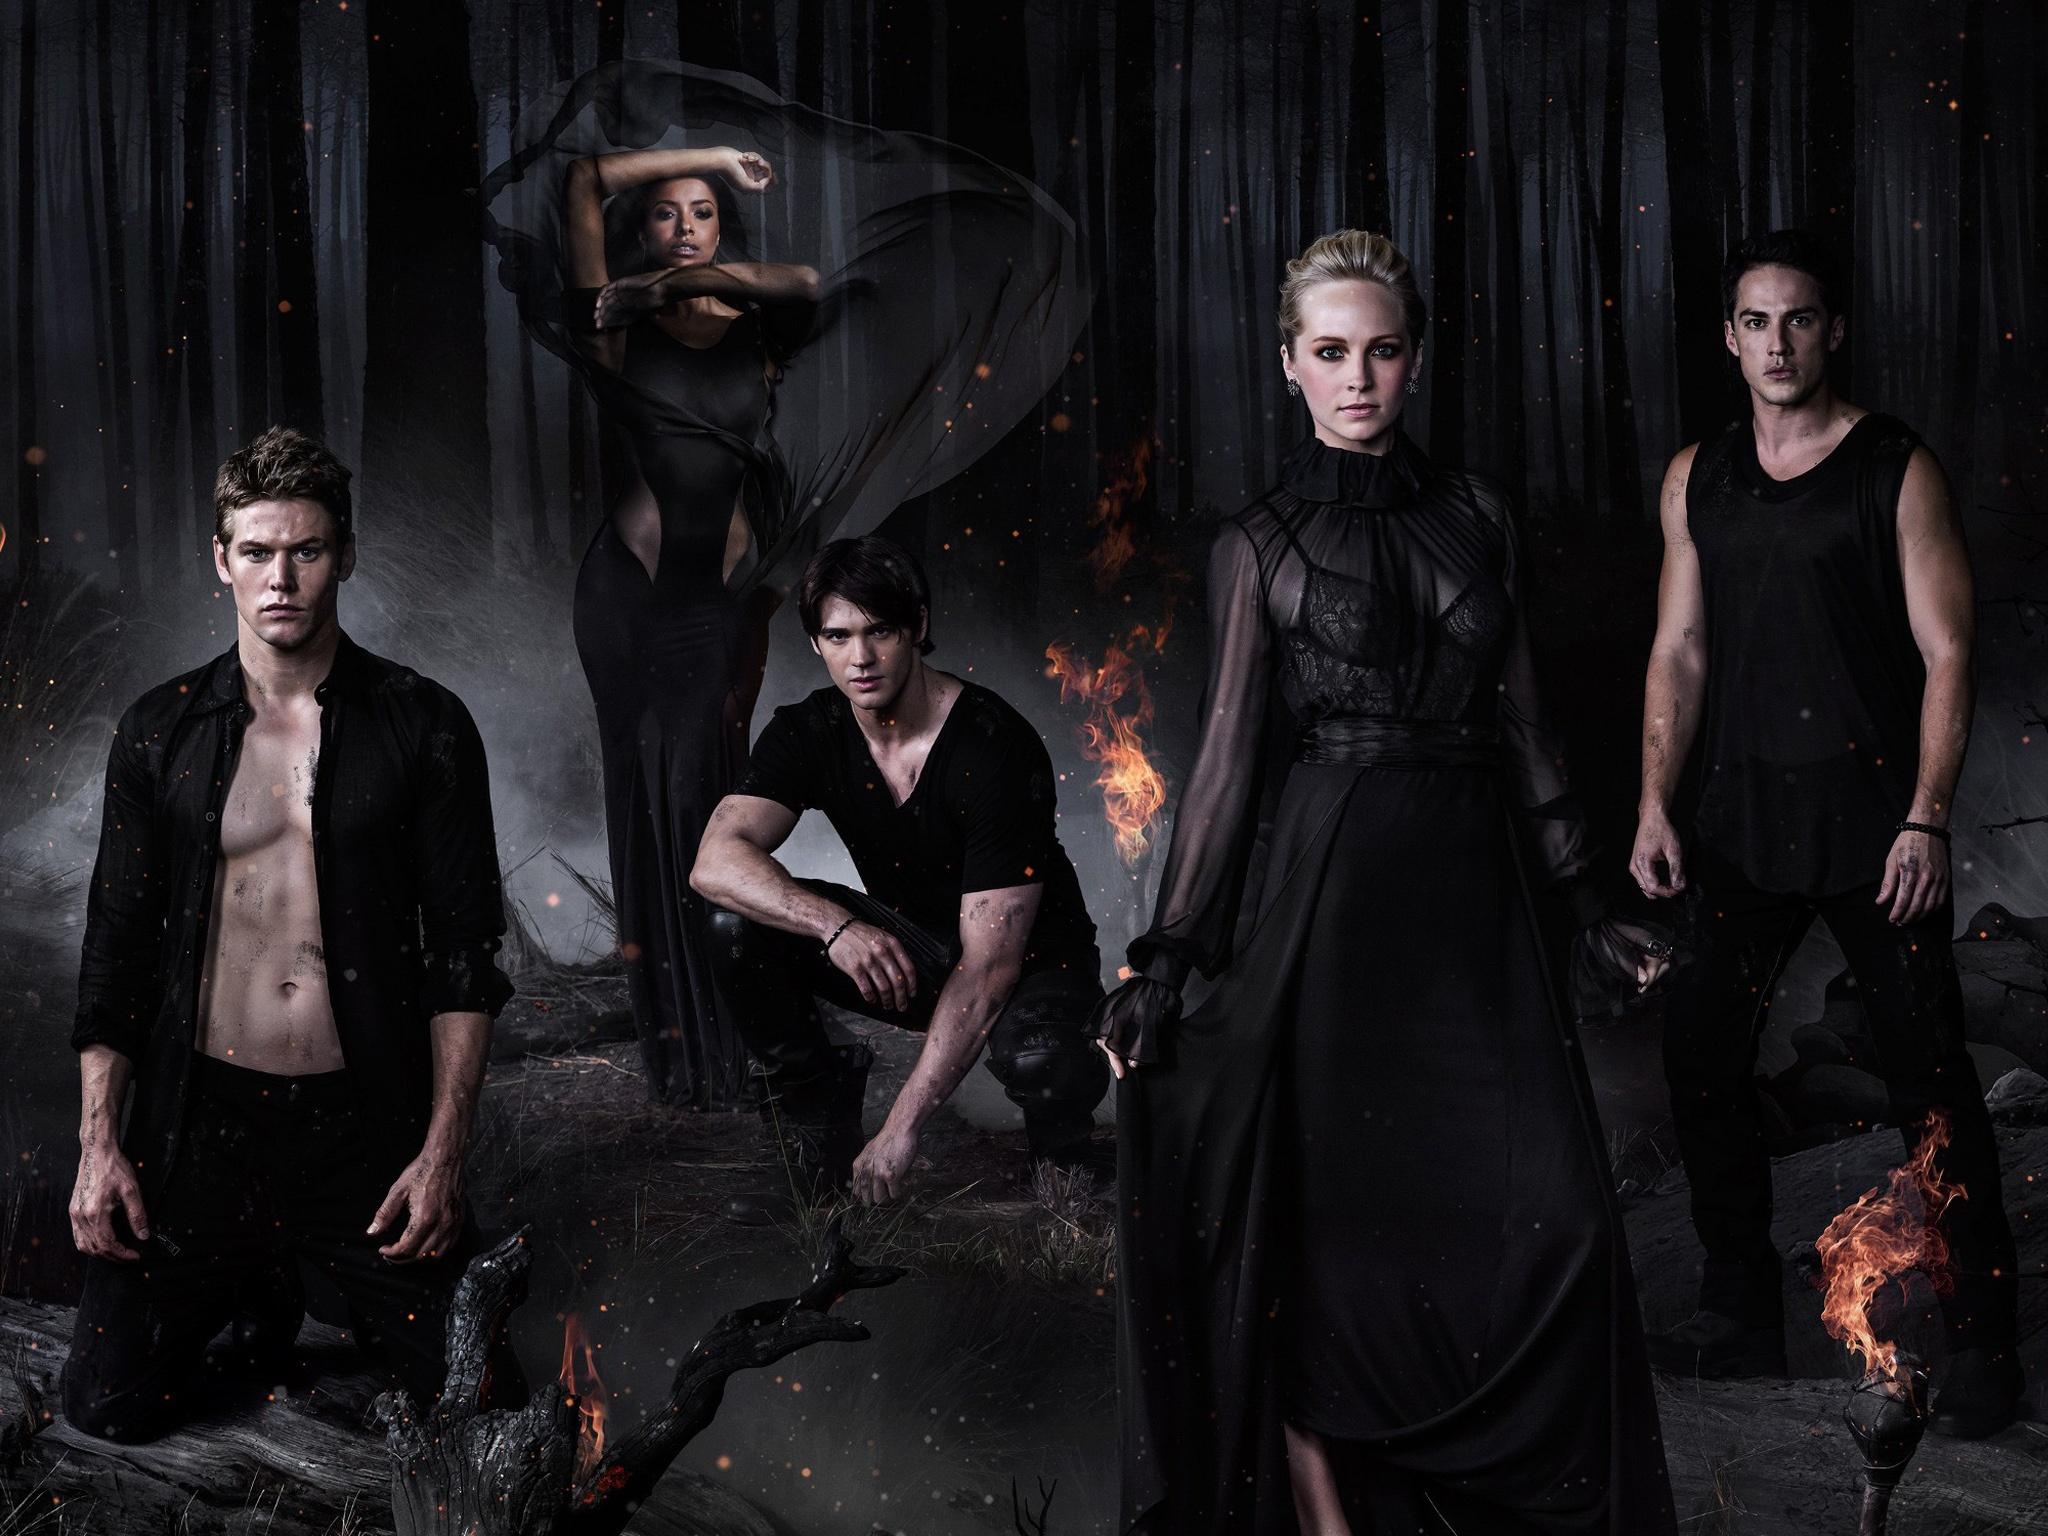 the vampire diaries season 5 pirate bay